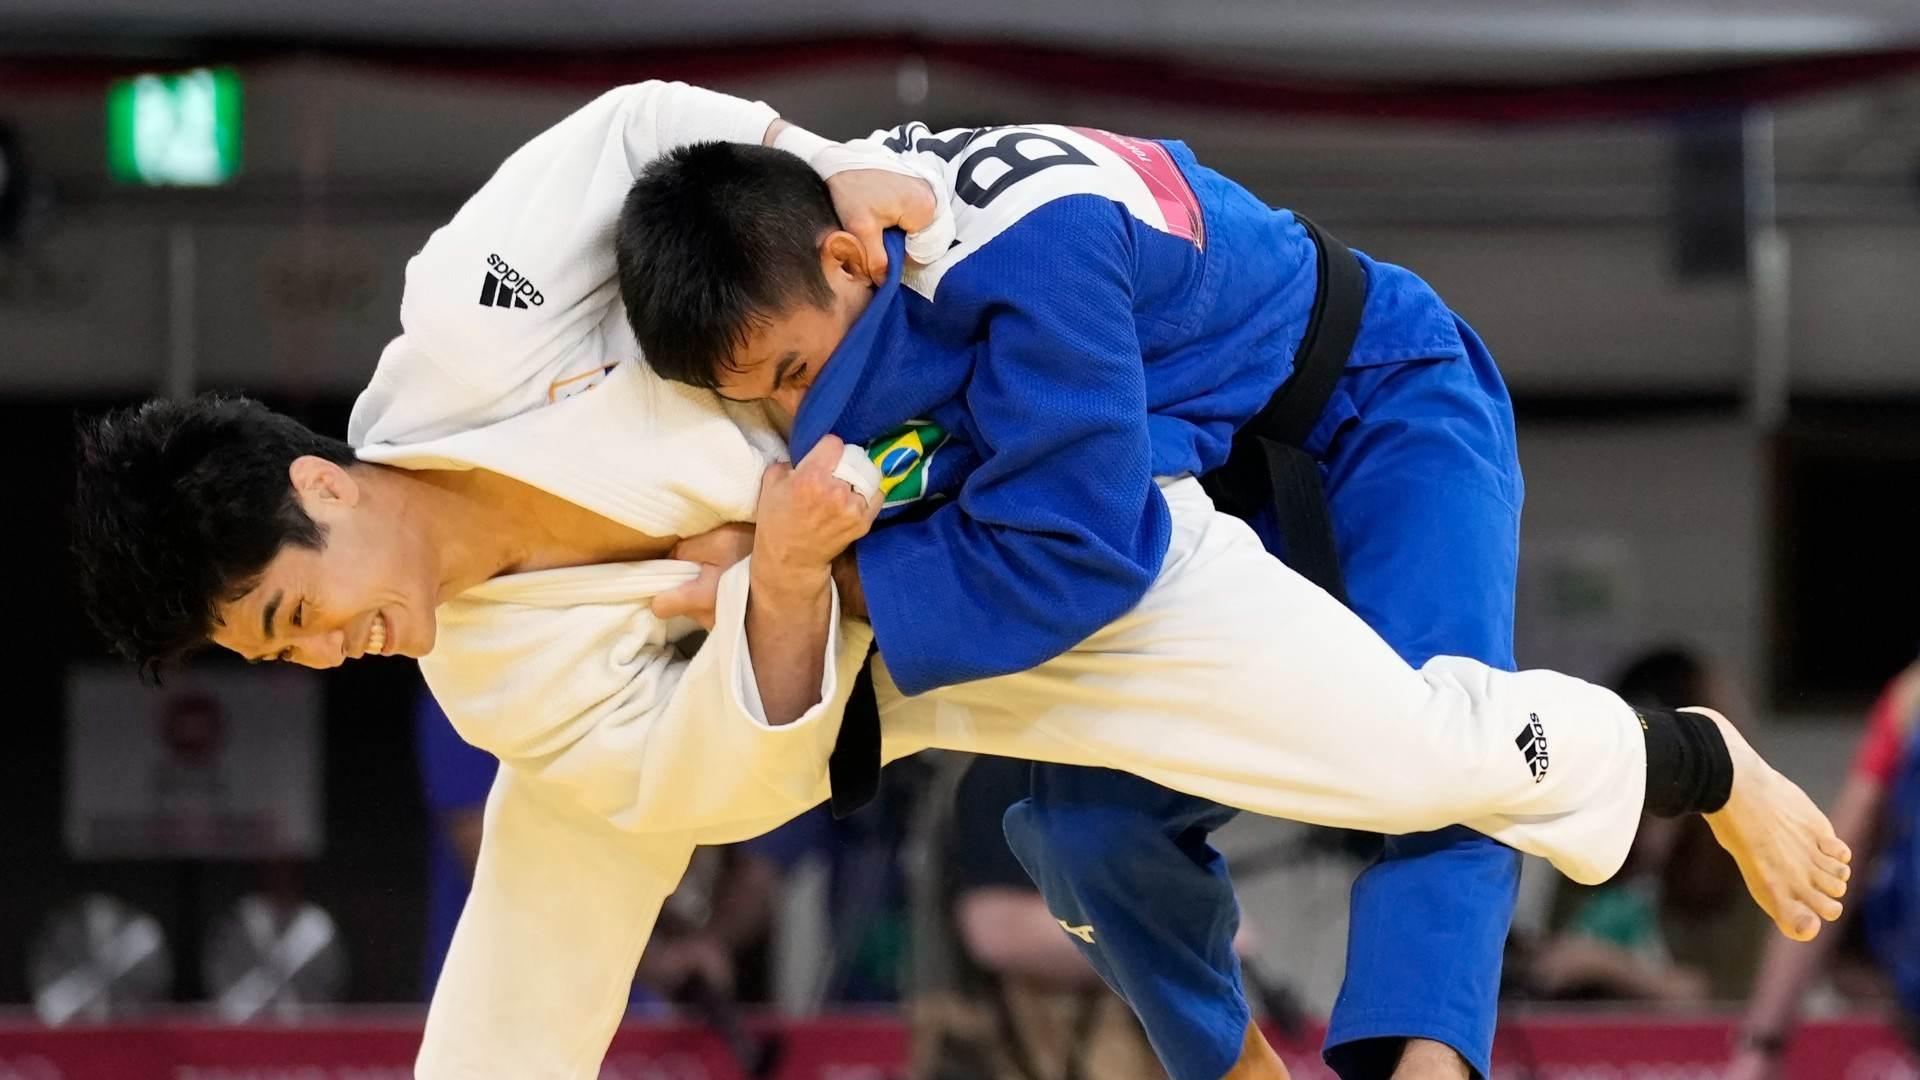 Brasileiro Eric Takabatake acabou eliminado pelo sul-coreano Won-jin